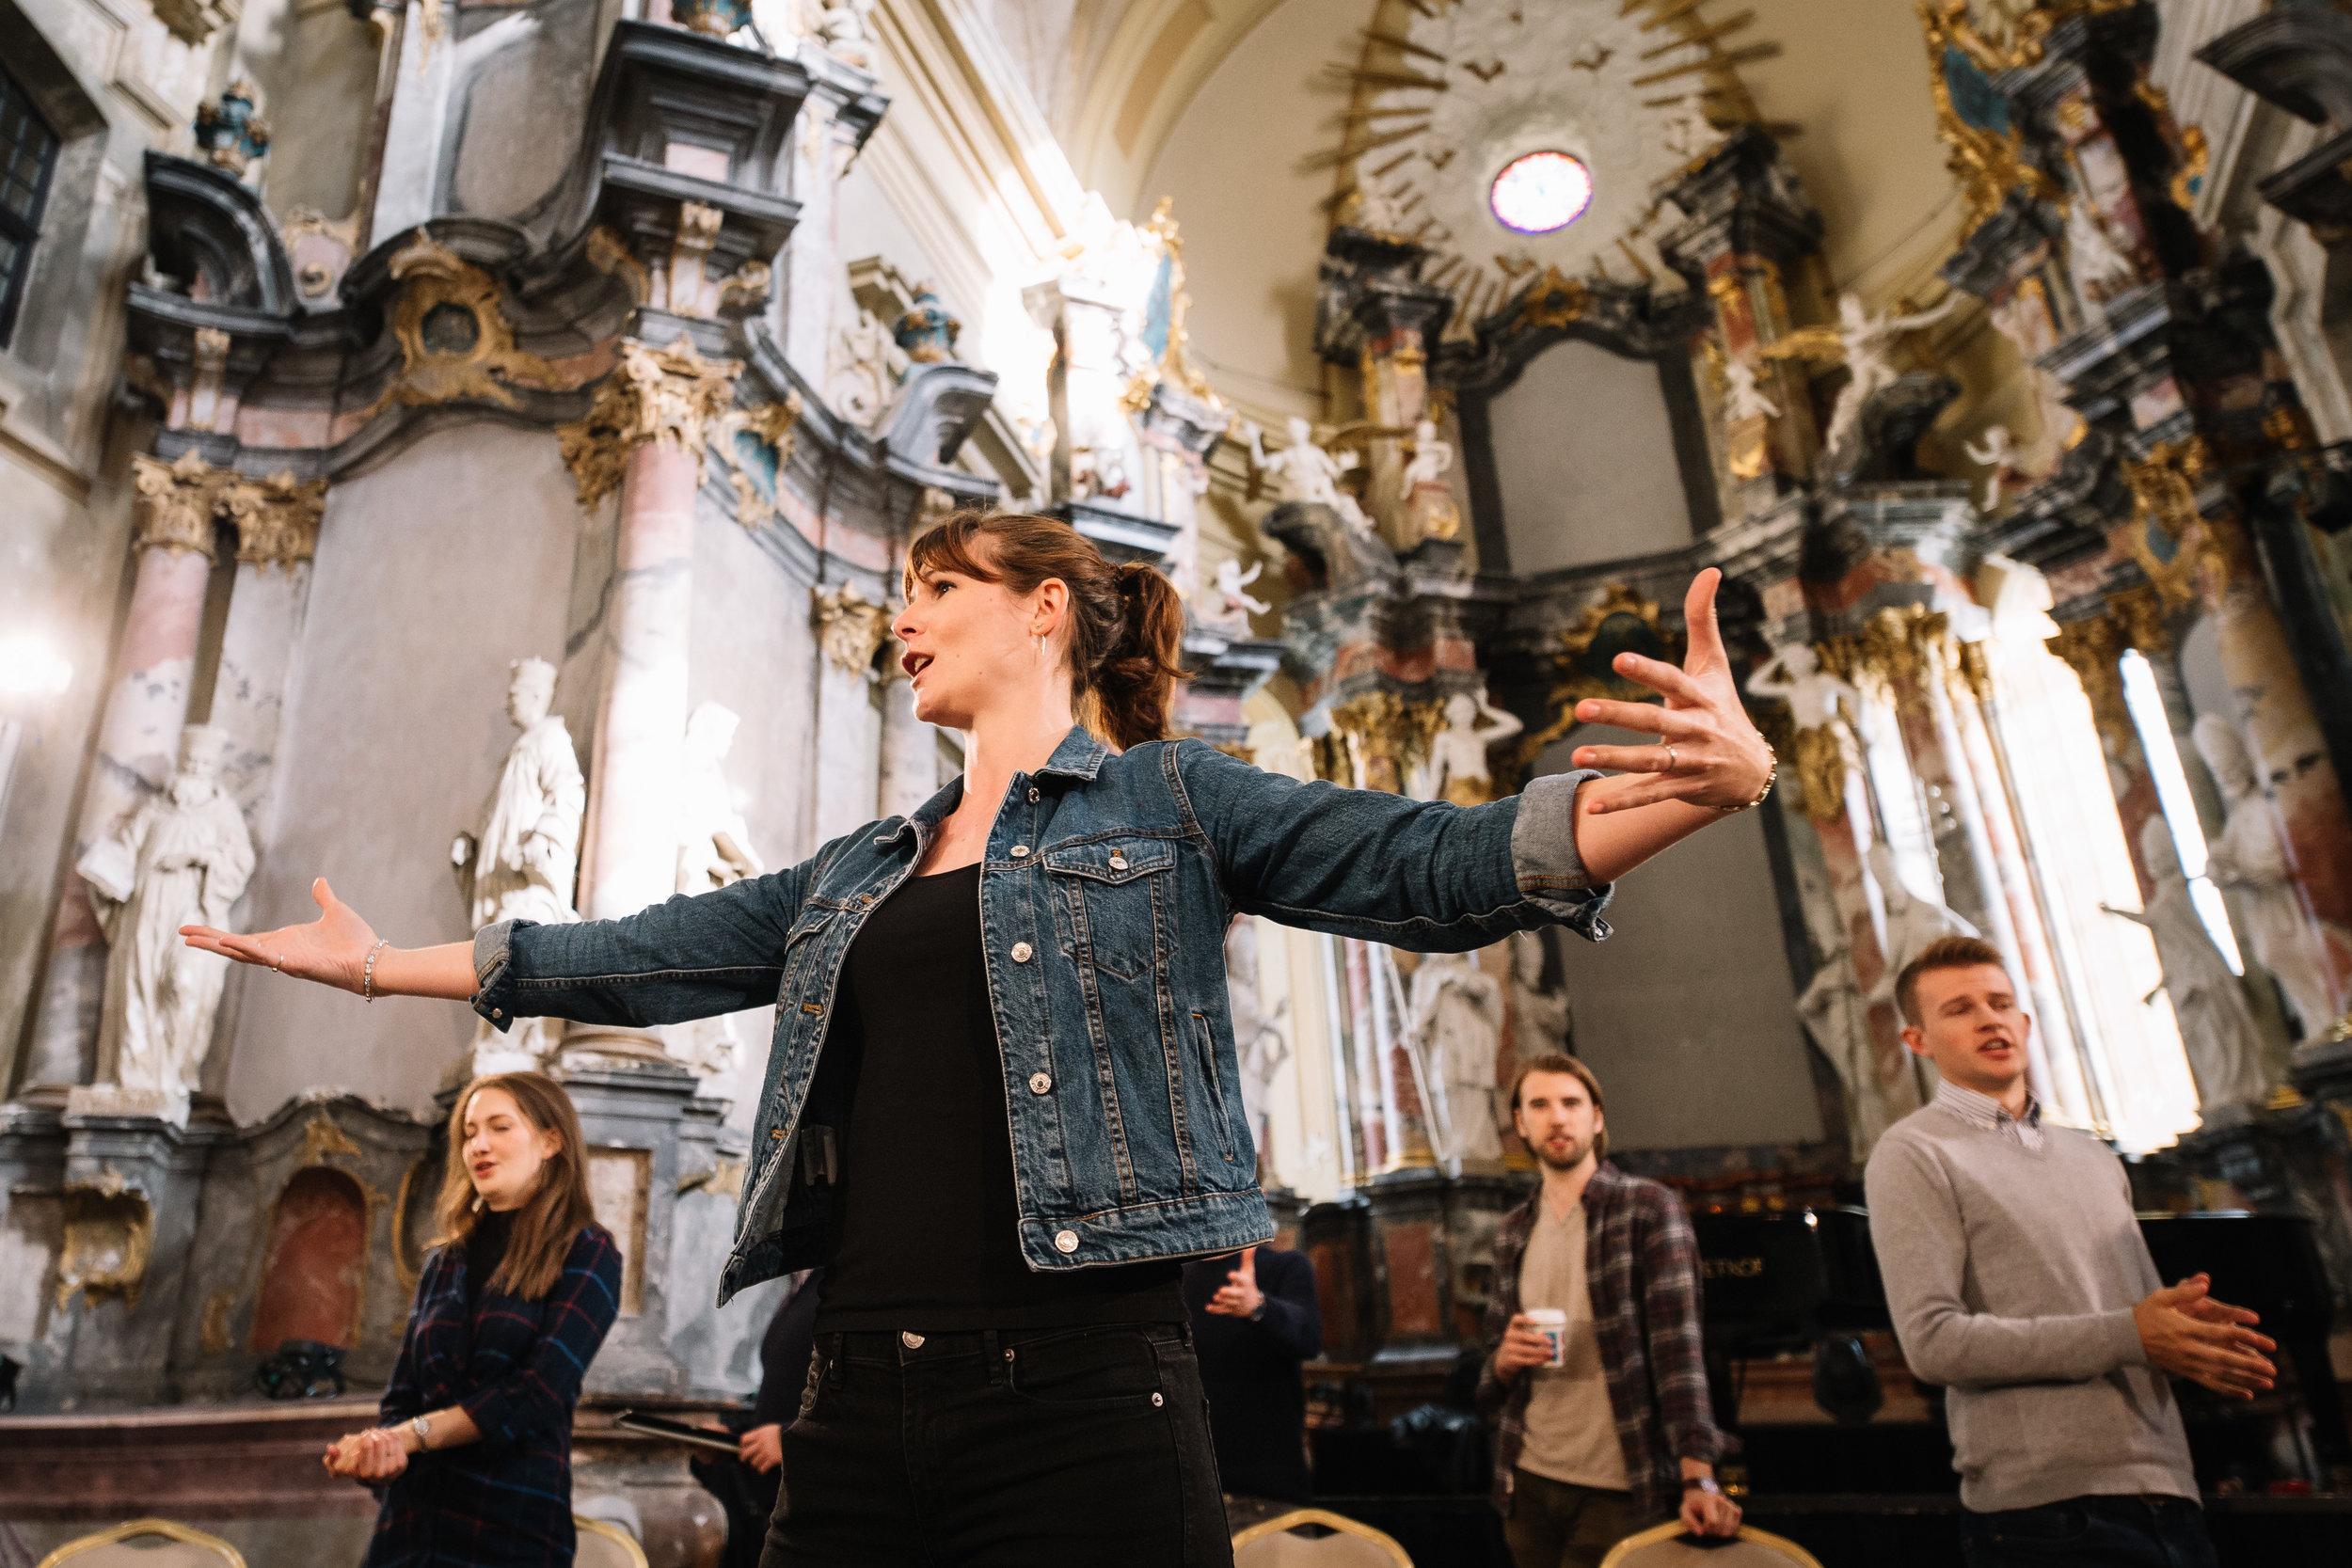 OTTW-VOCES8-Bel Canto Choir Vilnius-Masterclass-Sept28-2018-Credits-Mantas-HeadShooter-01.jpg